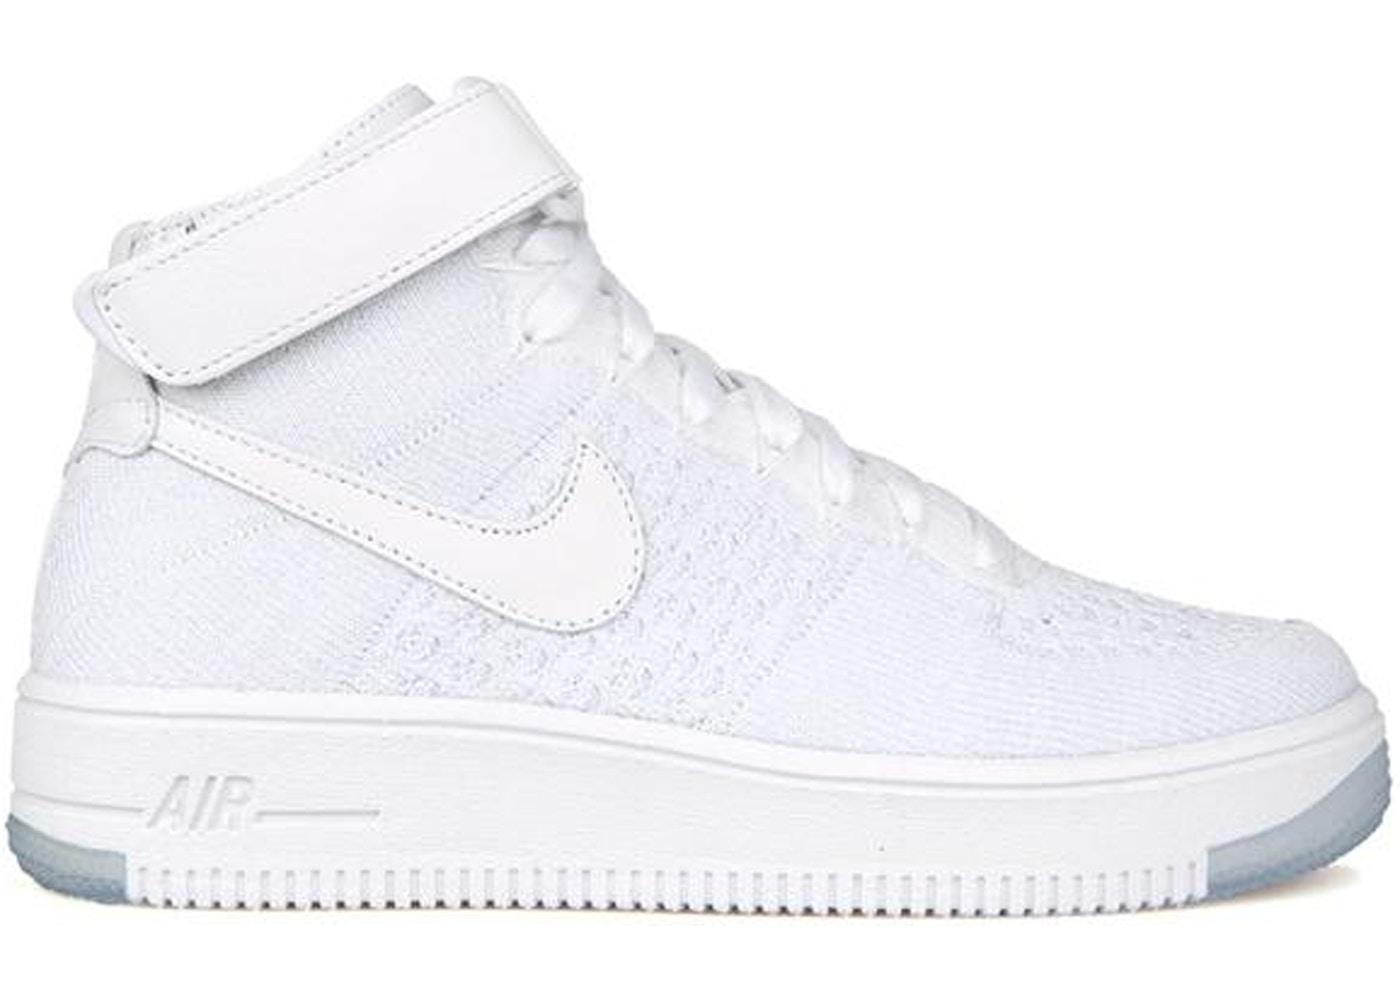 Nike Air Force 1 Flyknit Triple White (W) - 818018-100